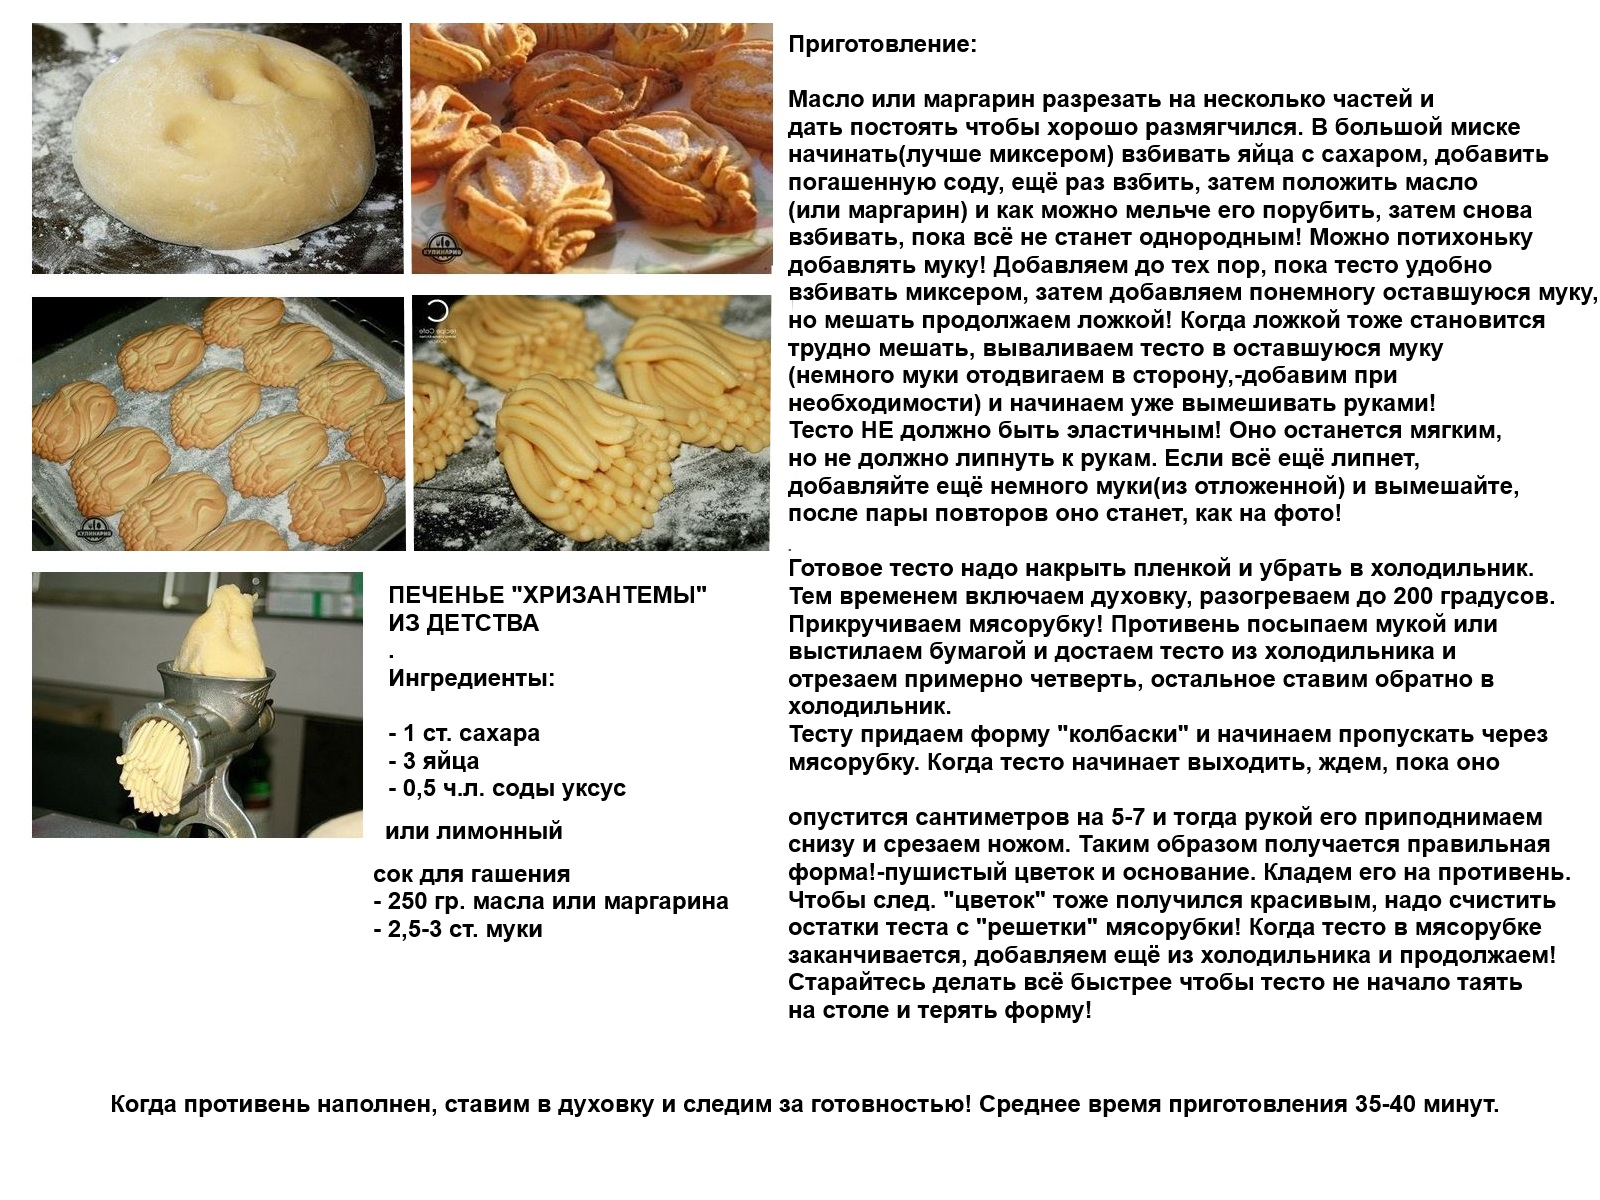 Сало через мясорубку рецепты с фото пошагово